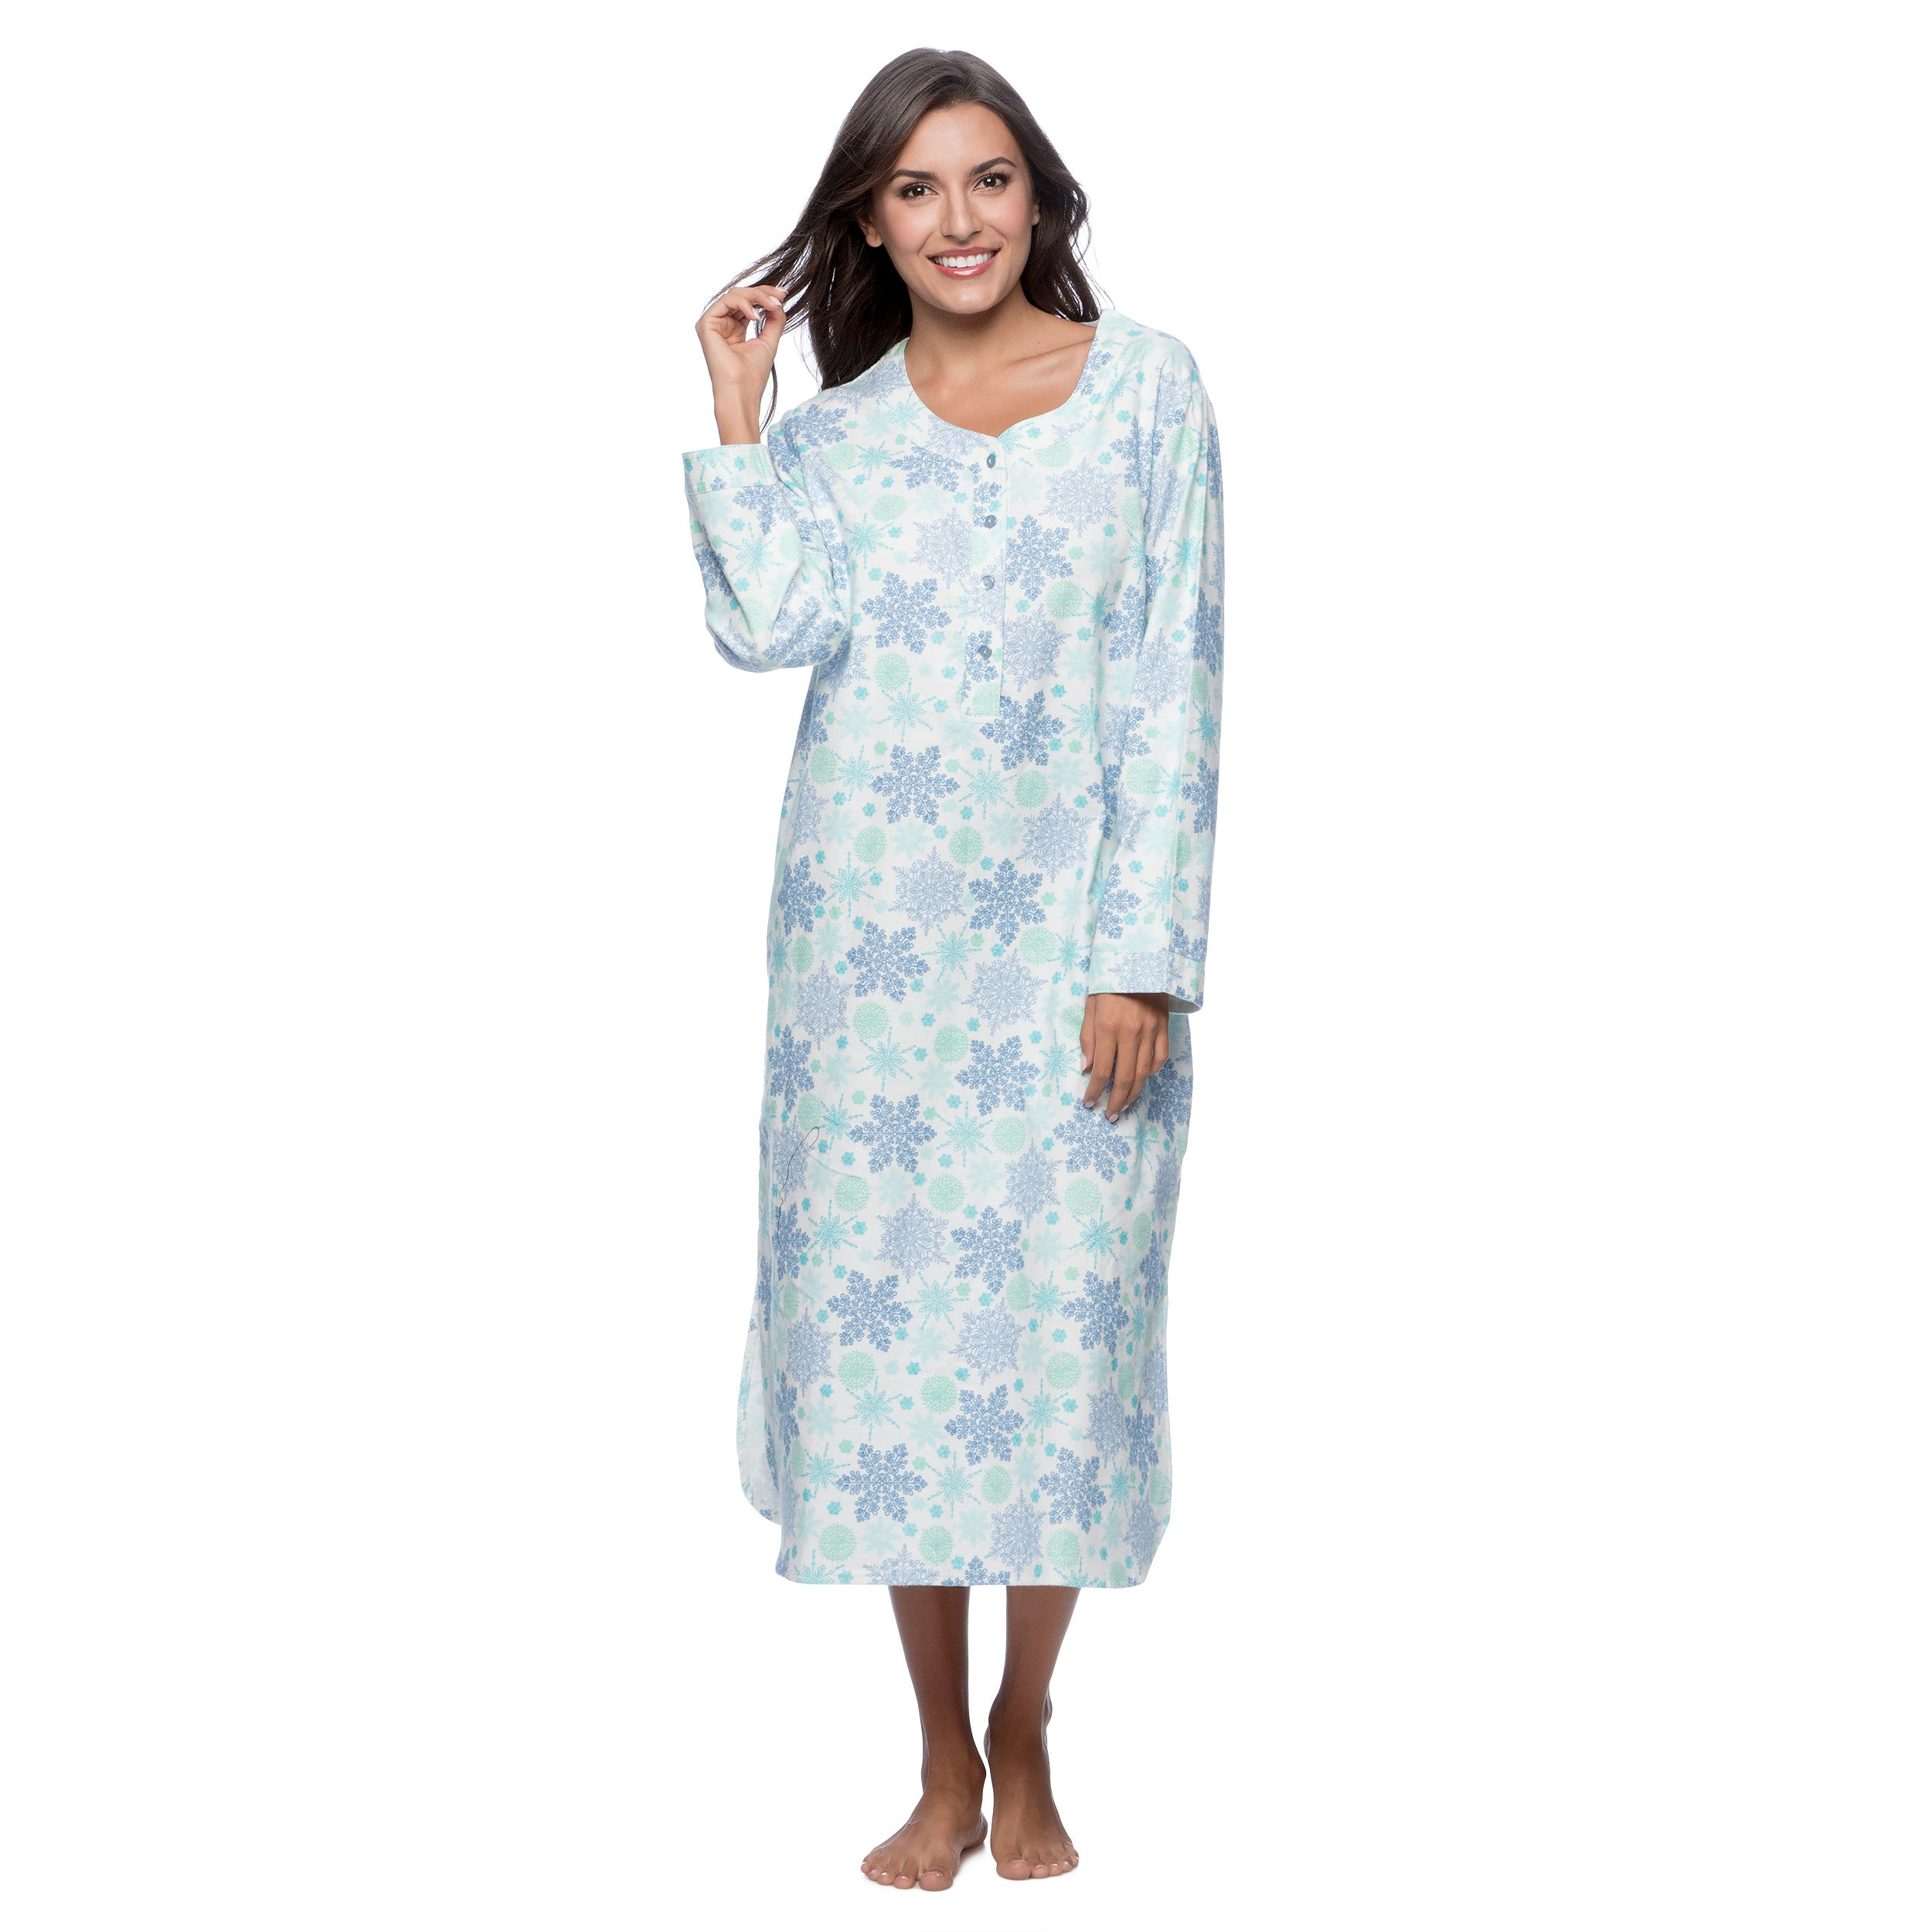 La Cera Women's Blue Snowflake Print Pull-over Gown (Extr...